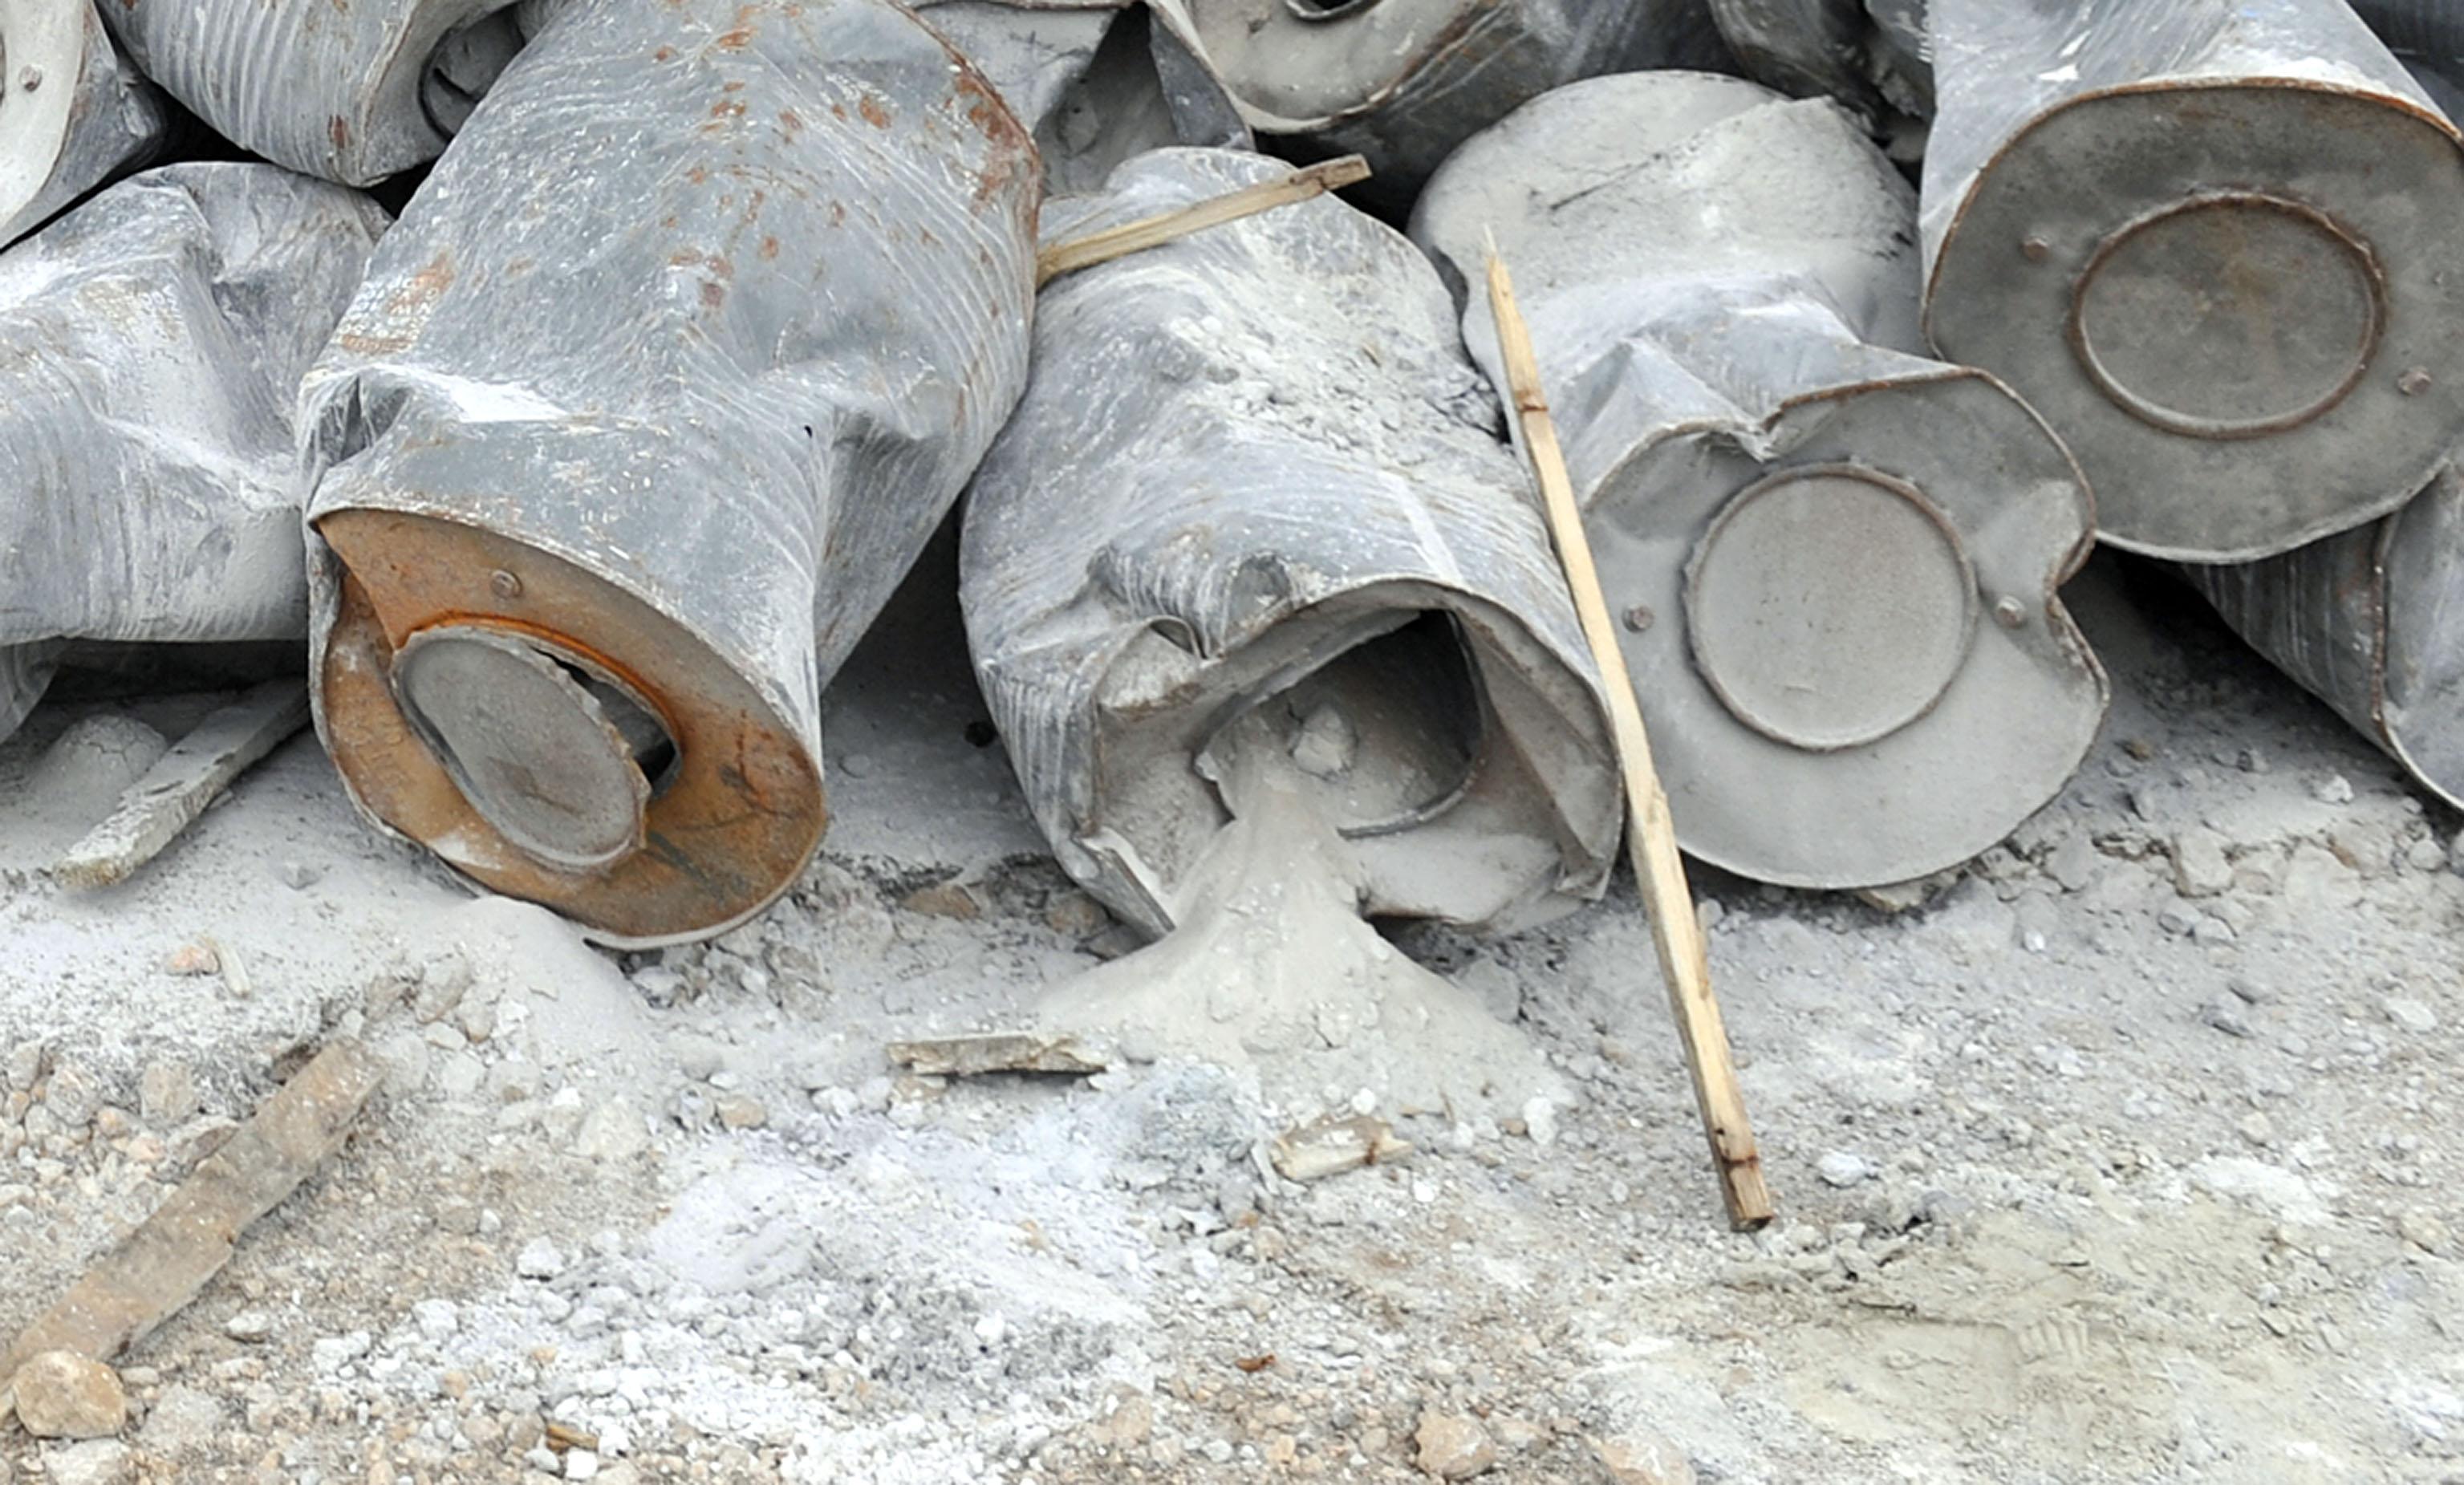 Kalcijev karbid, popularno zvan karbit, svrstava se među opasan otpad i čije je odlaganje u okoliš strogo zabranjeno / Snimio Vedran KARUZA